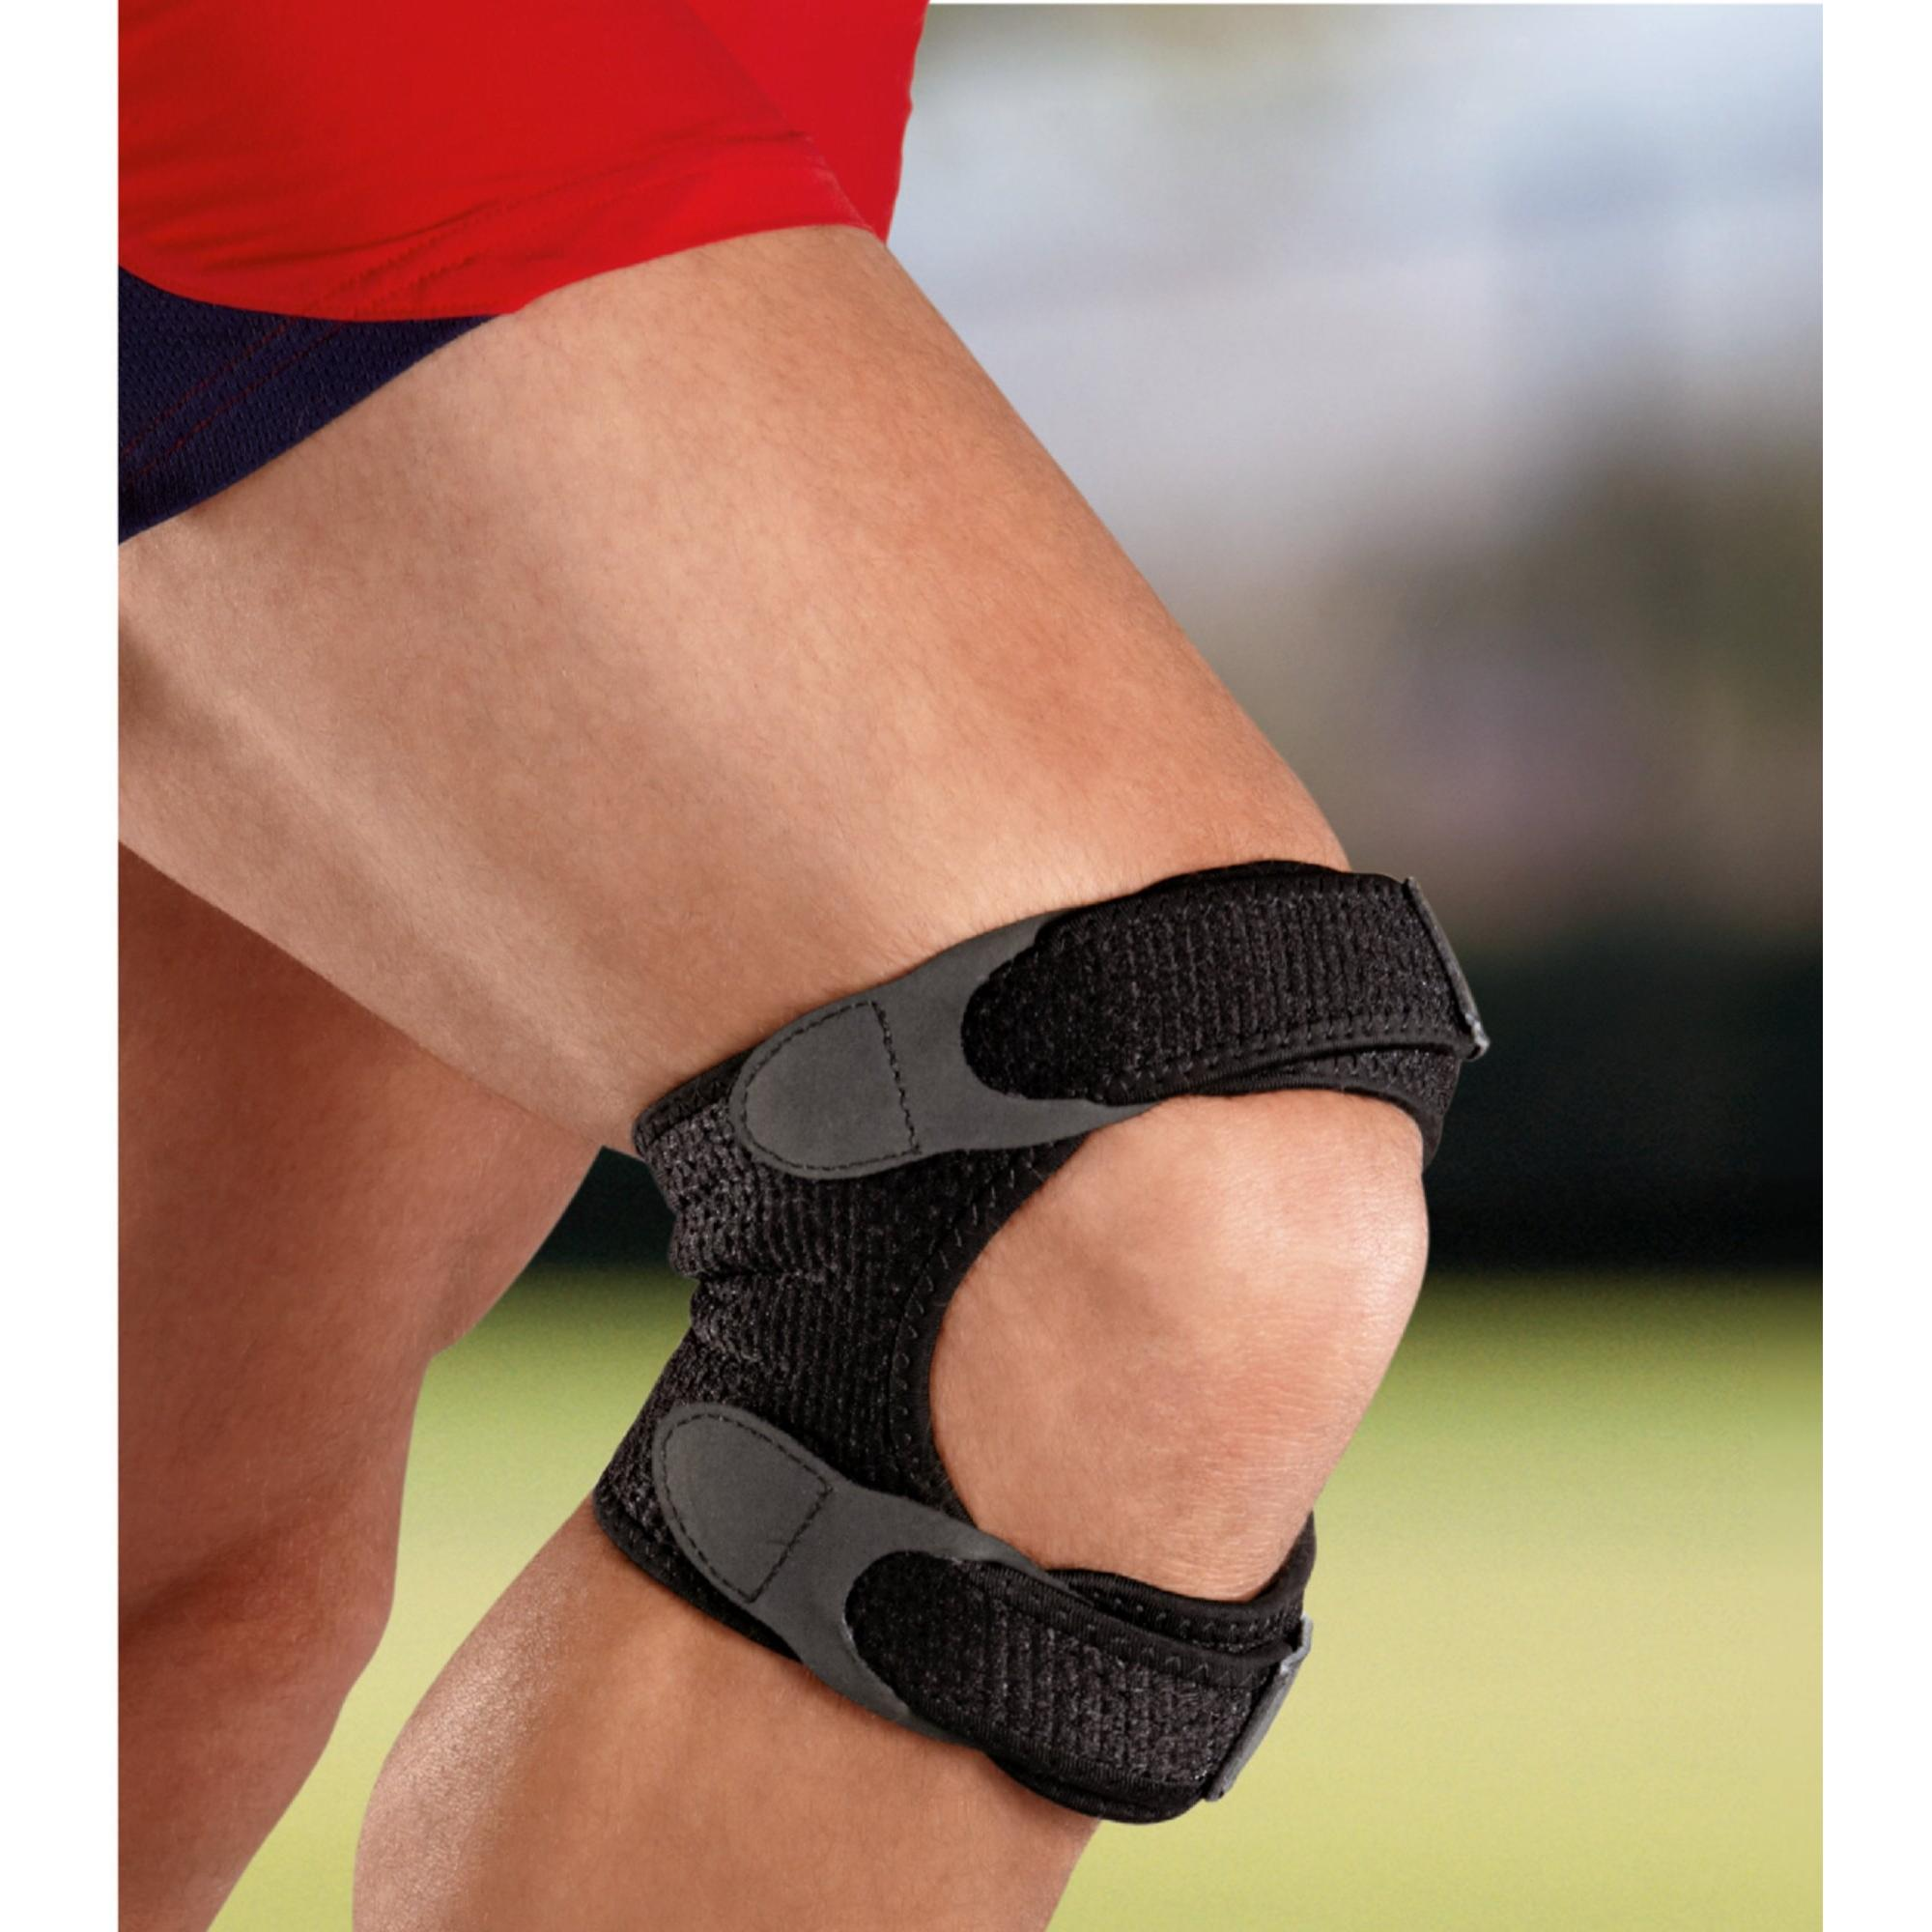 c0756f9825 ACE Brand Dual Knee Strap, Adjustable, Black, 1/Pack - Walmart.com